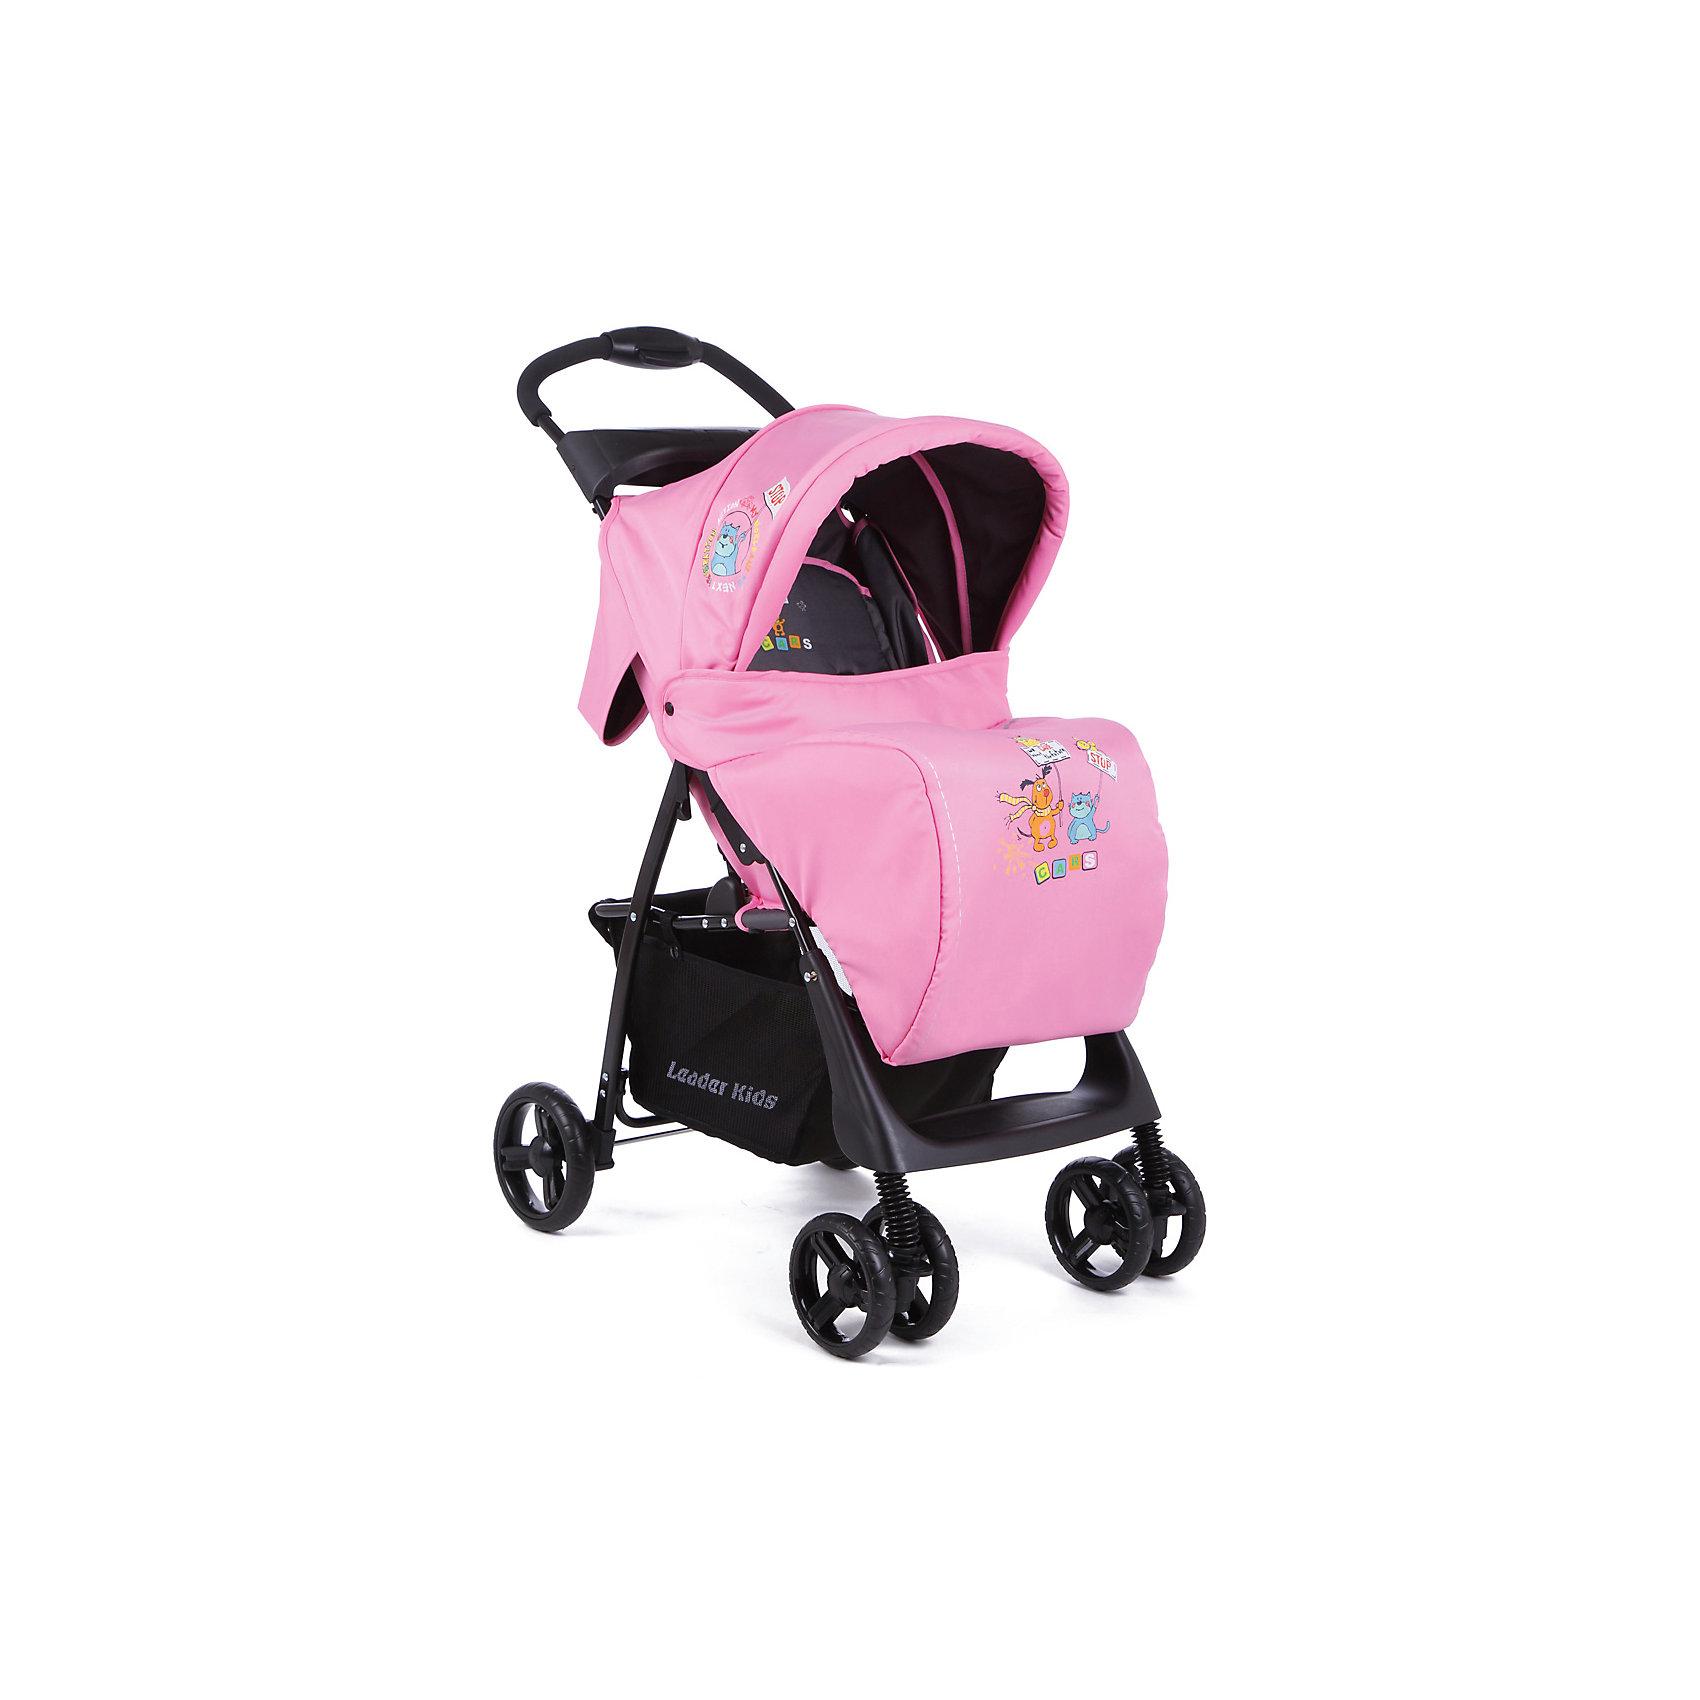 Прогулочная коляска В 110 Leader kids , розовый/серый